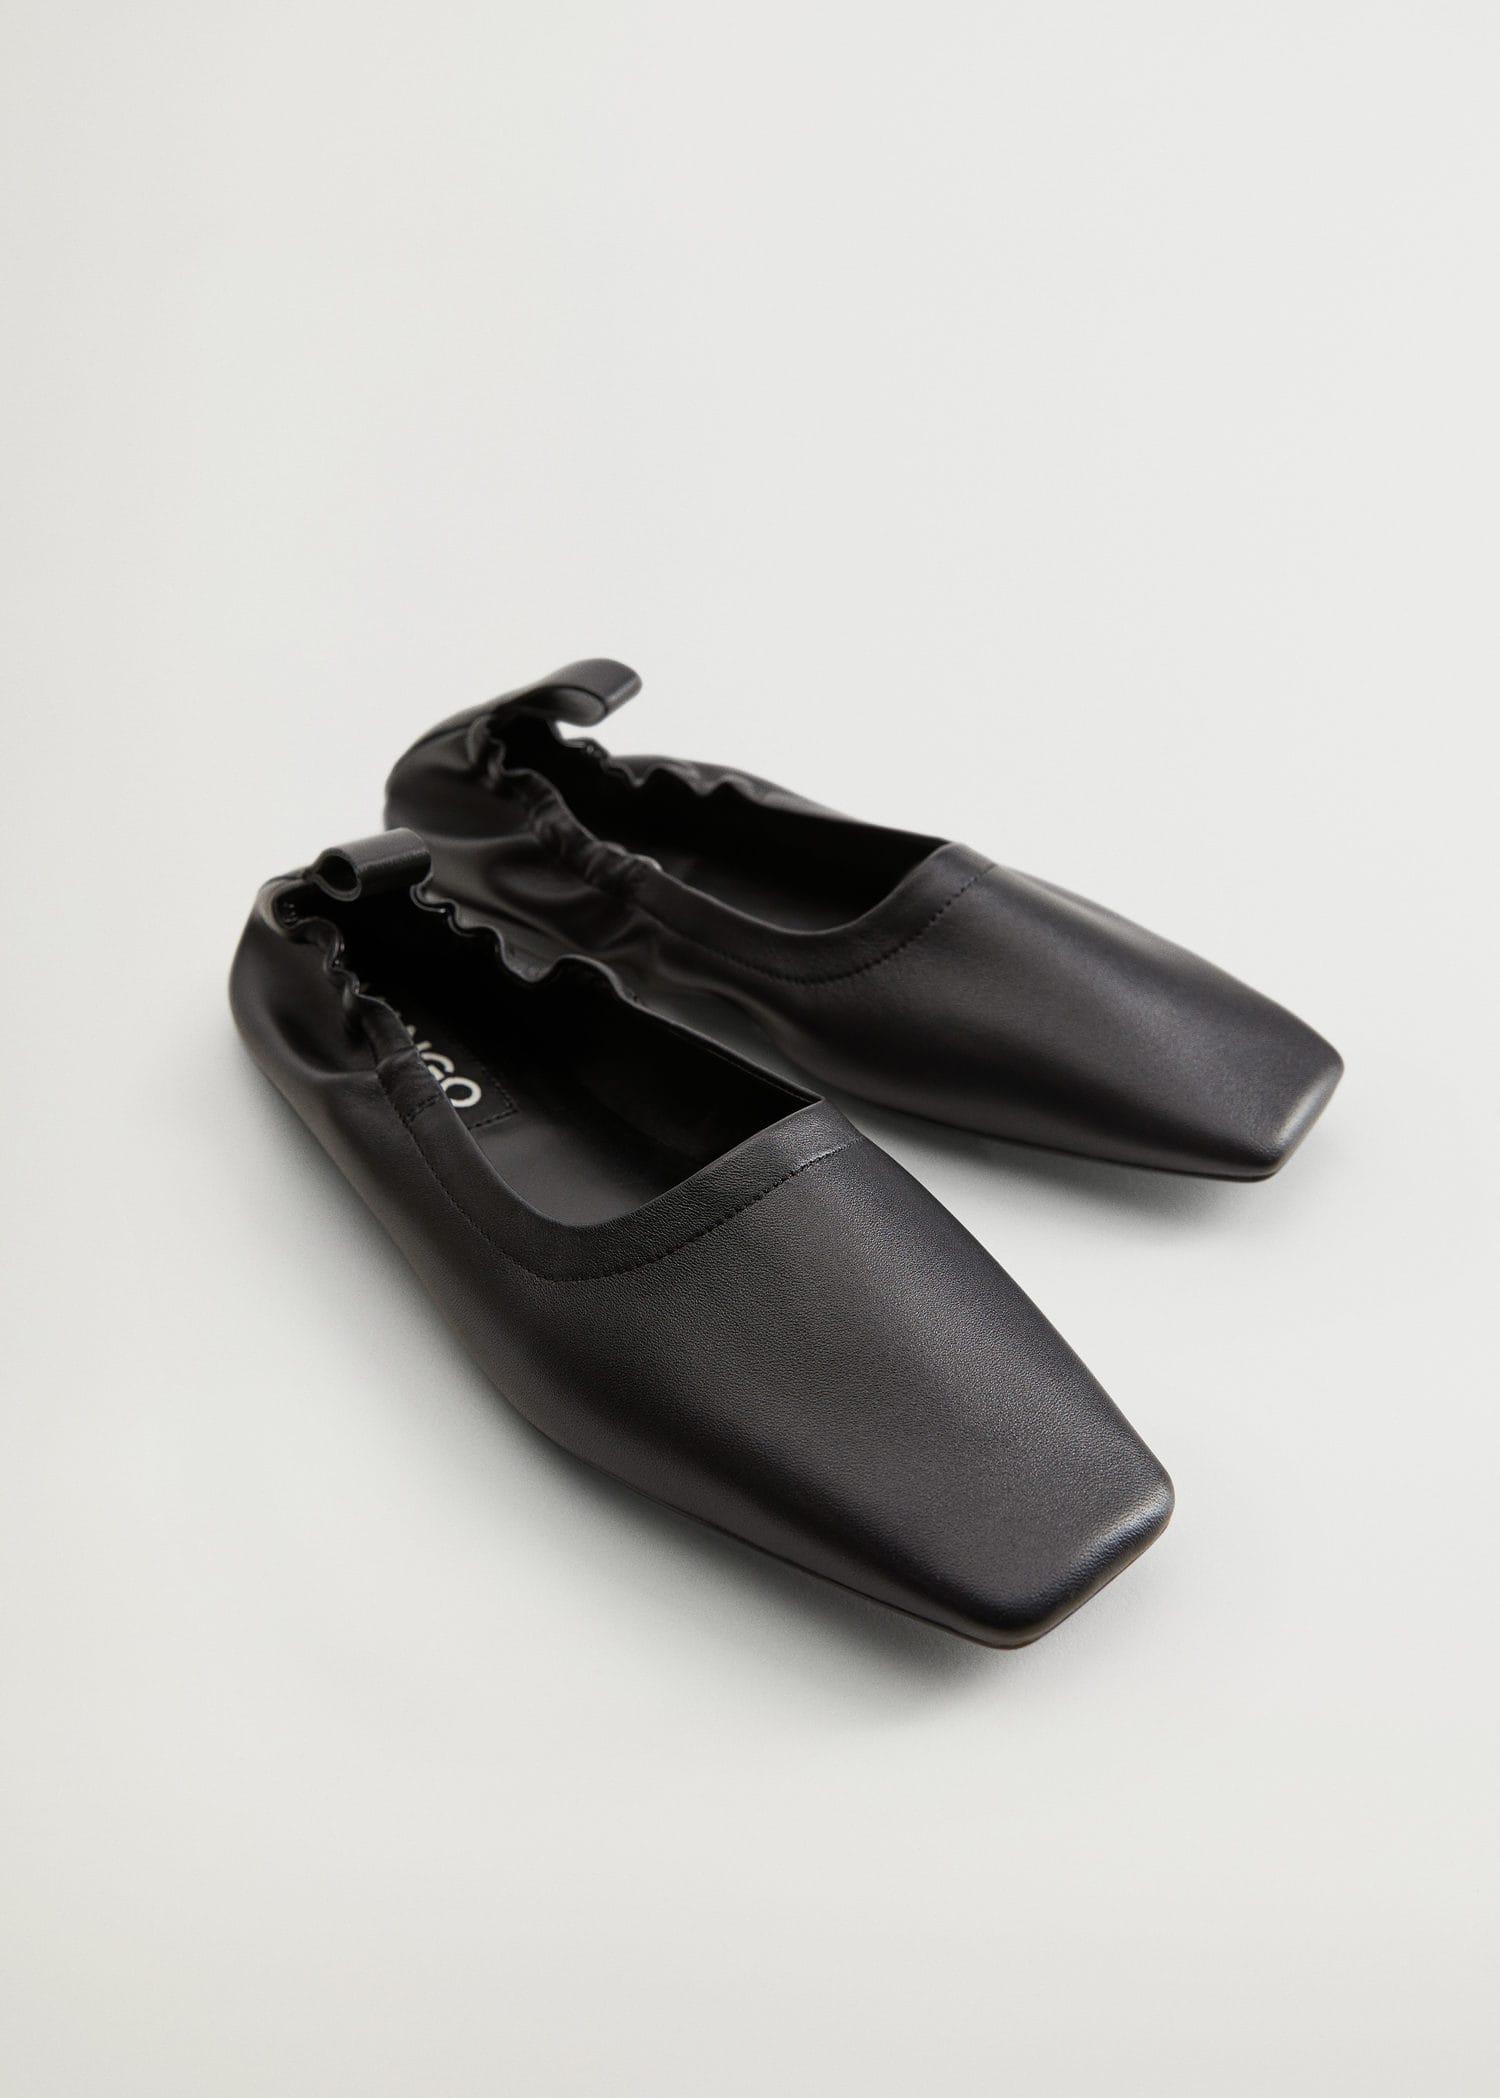 Gathered leather ballerina - Medium plane